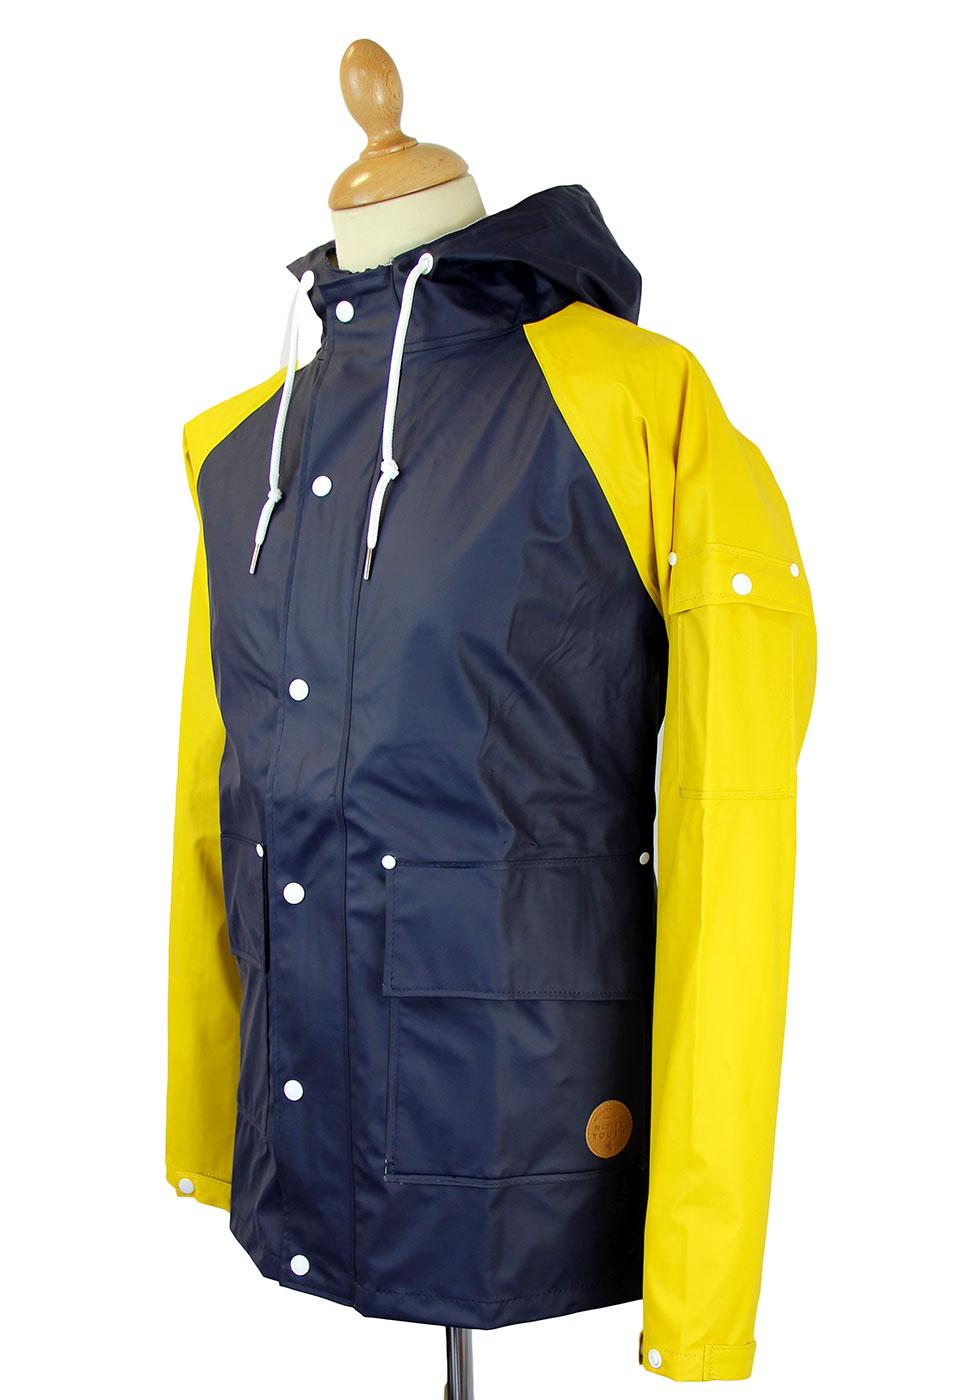 e2e3b1e4a NATIVE YOUTH Retro Indie Contrast Sleeve Fisherman Jacket Navy